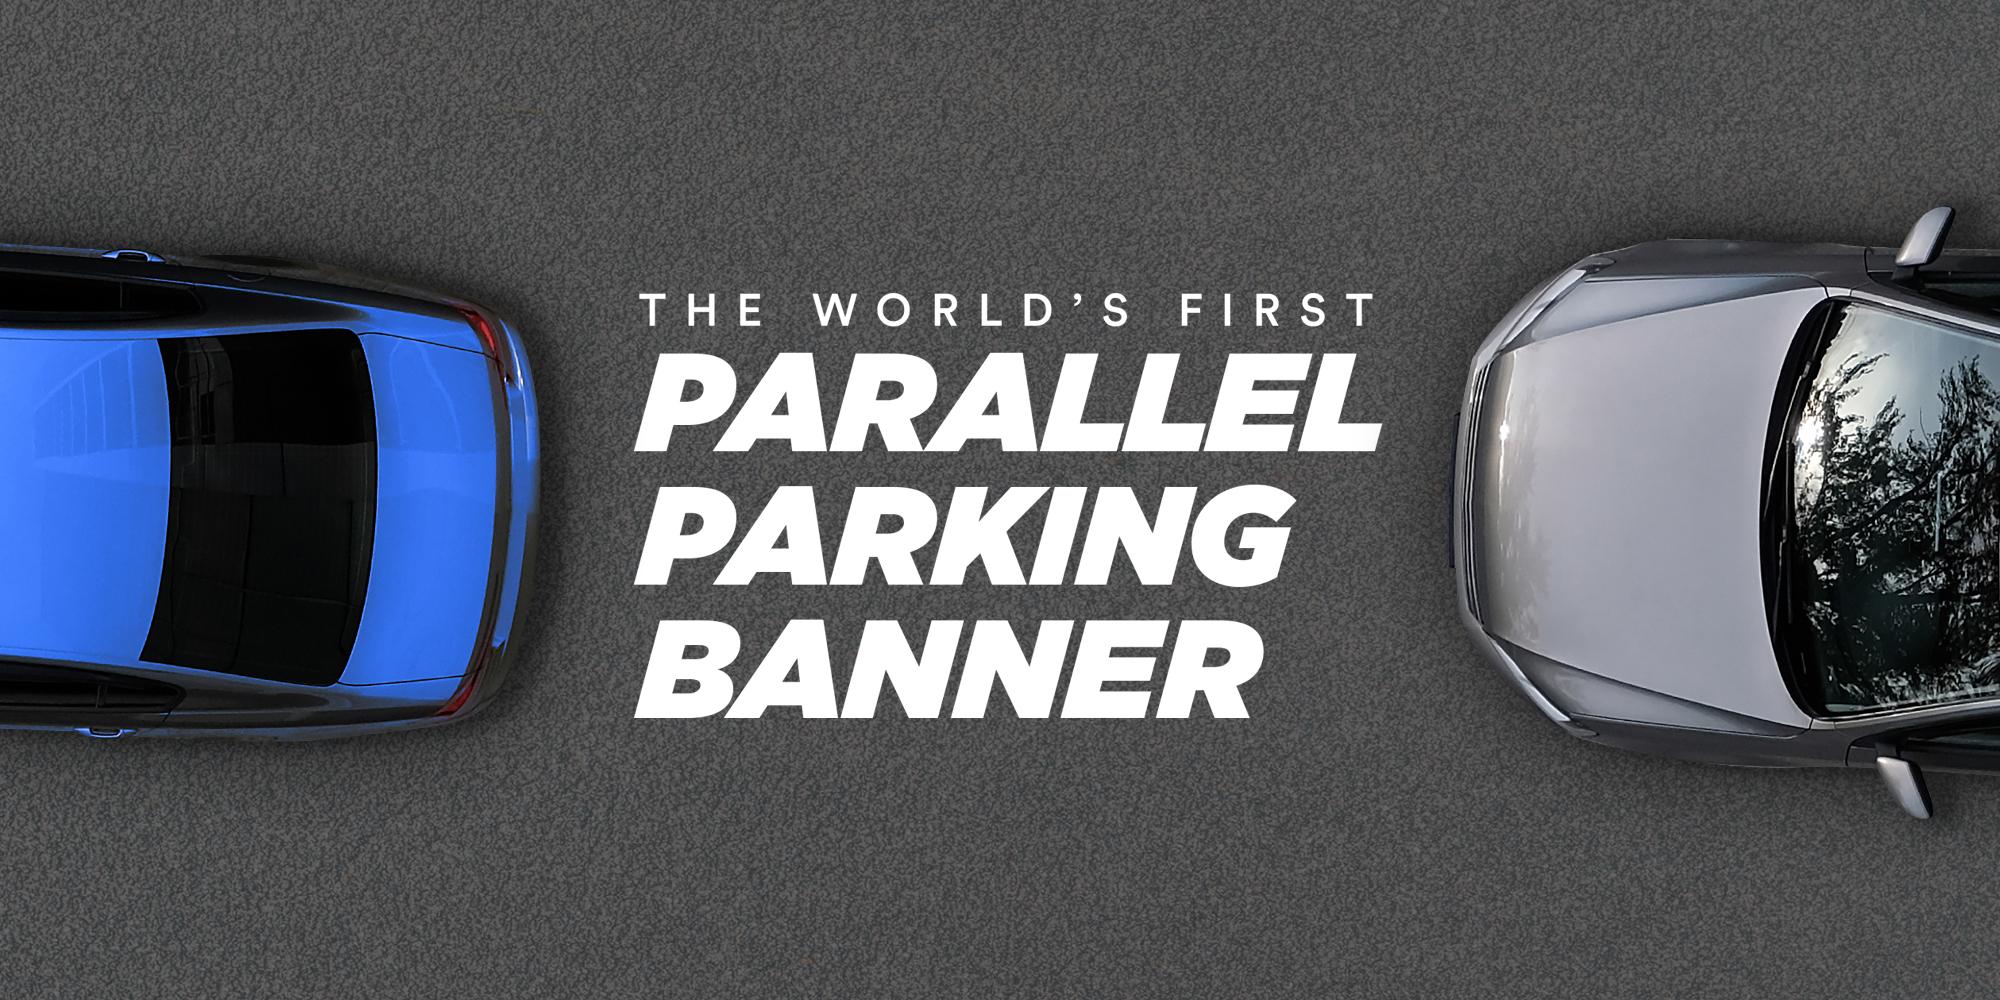 Parallel Parking Banner